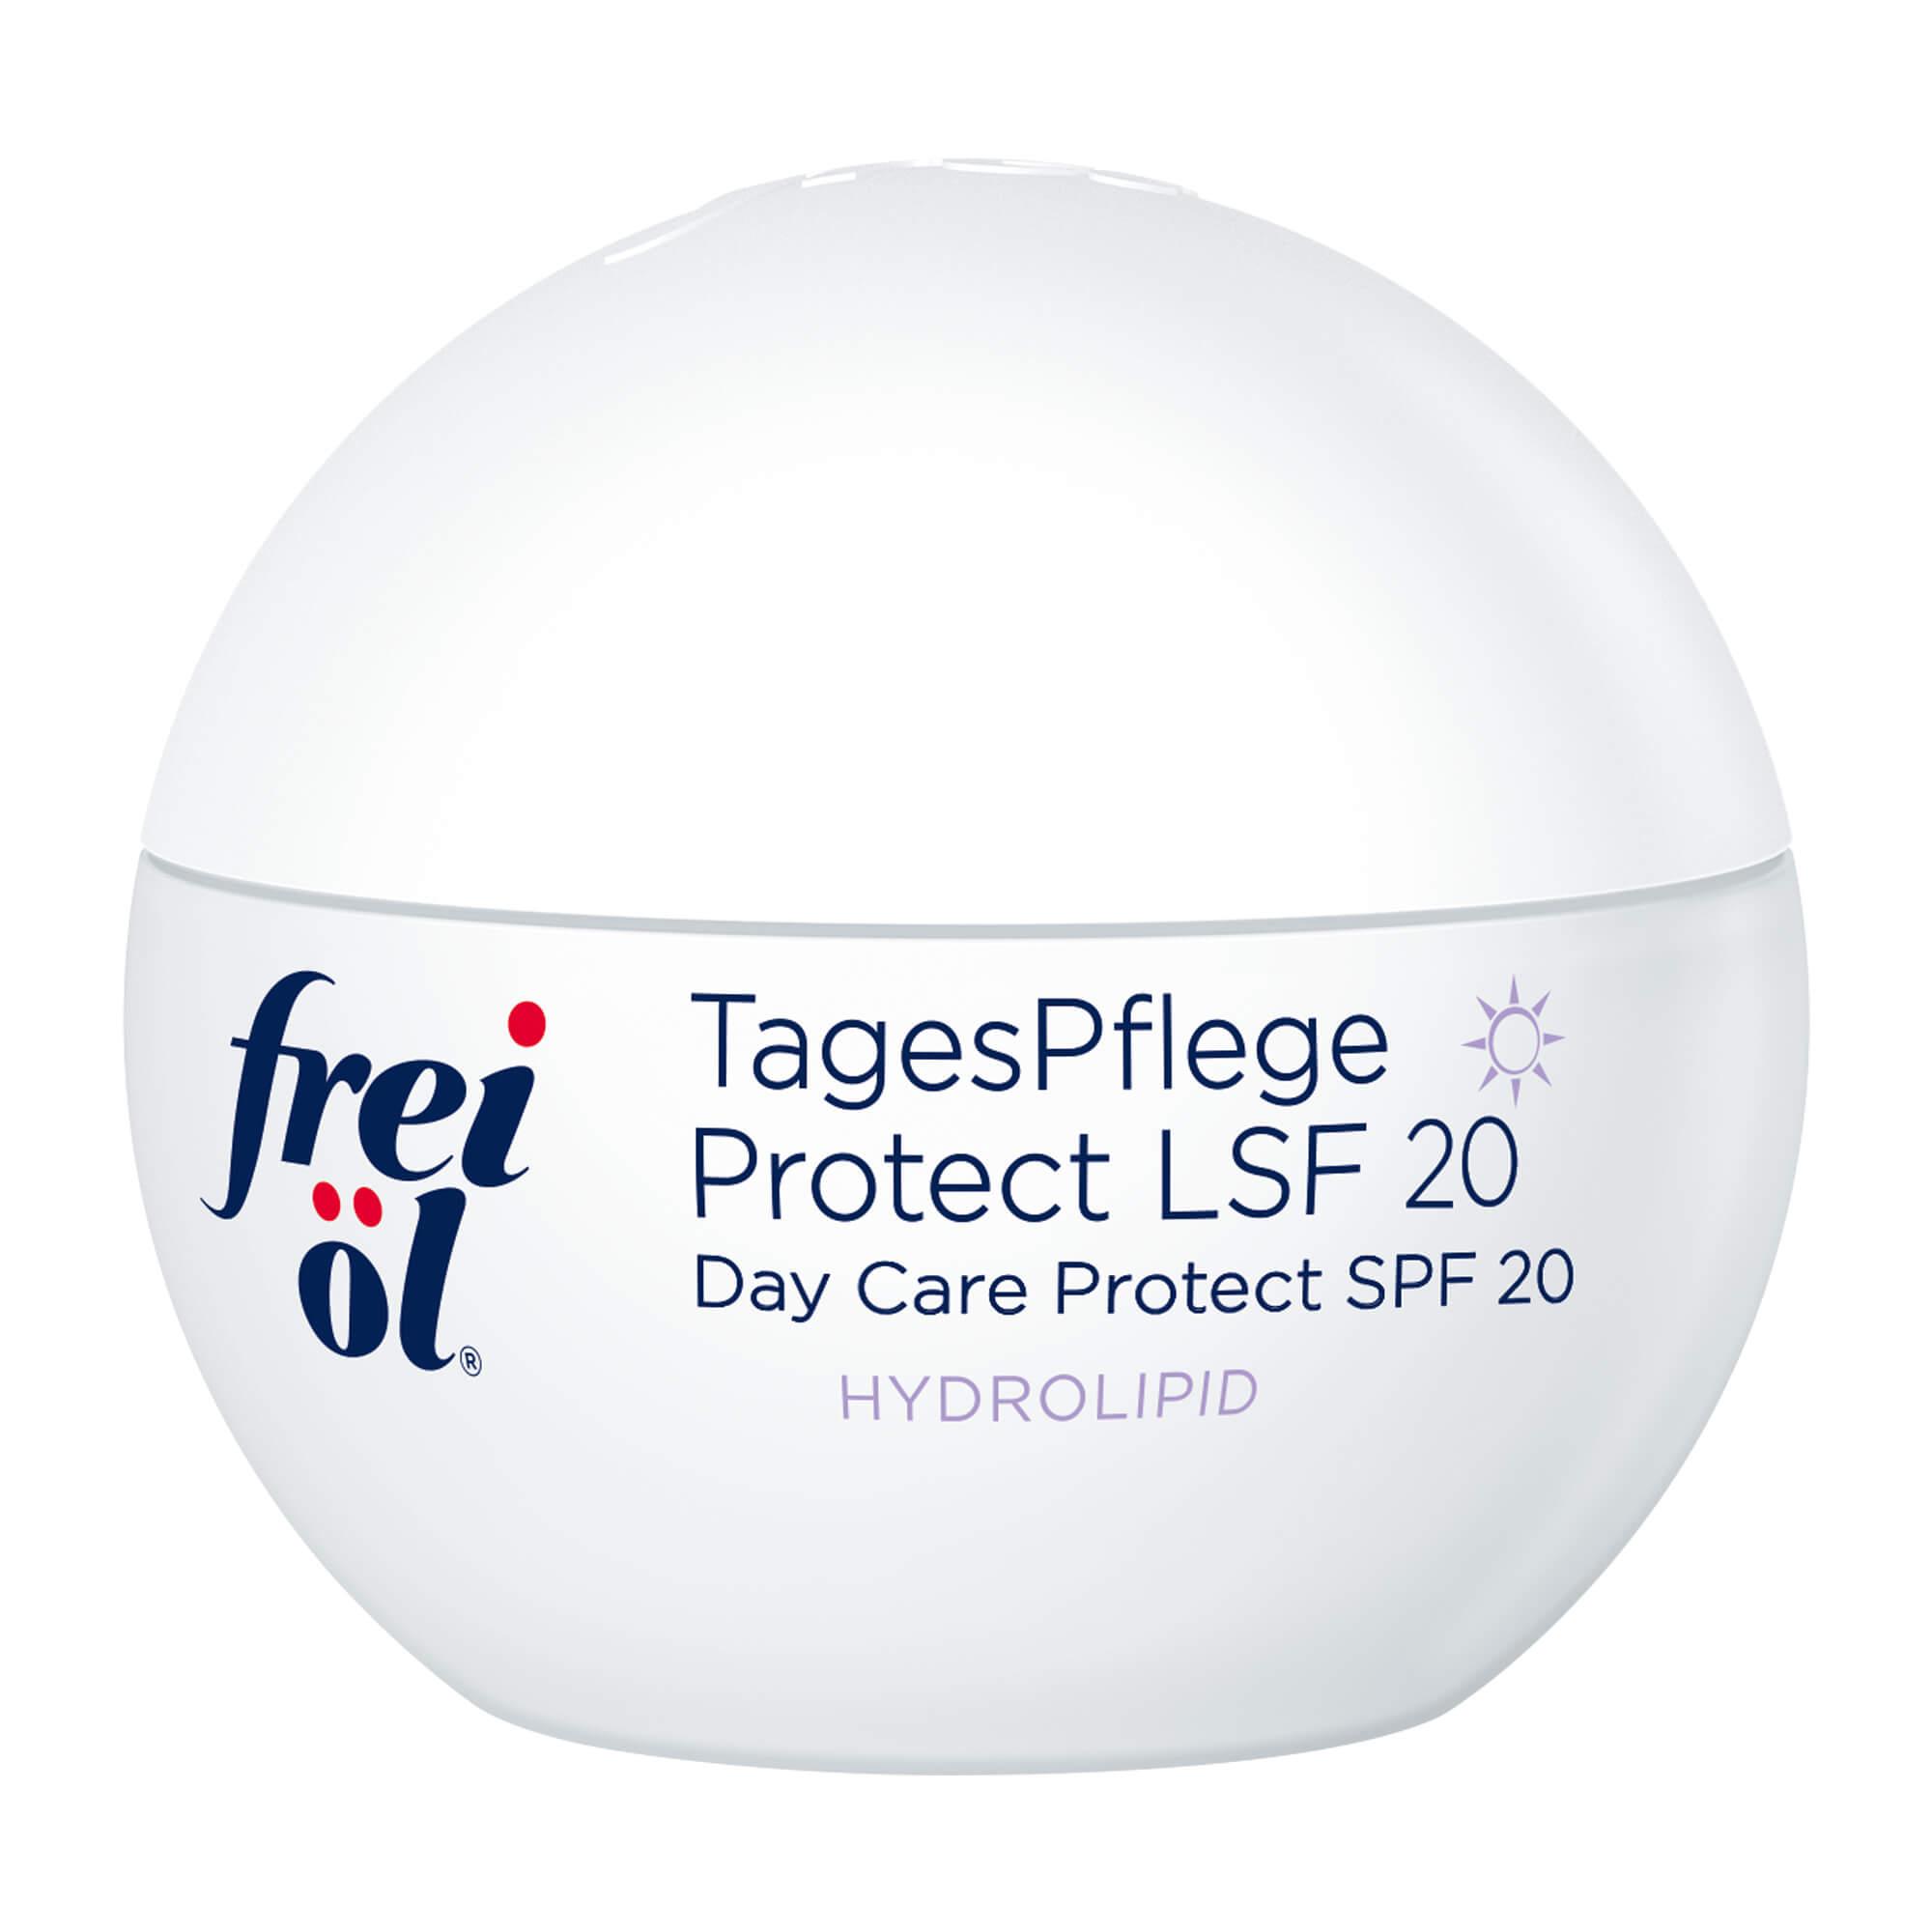 Frei Öl Hydrolipid TagesPflege Protect LSF 20 Creme